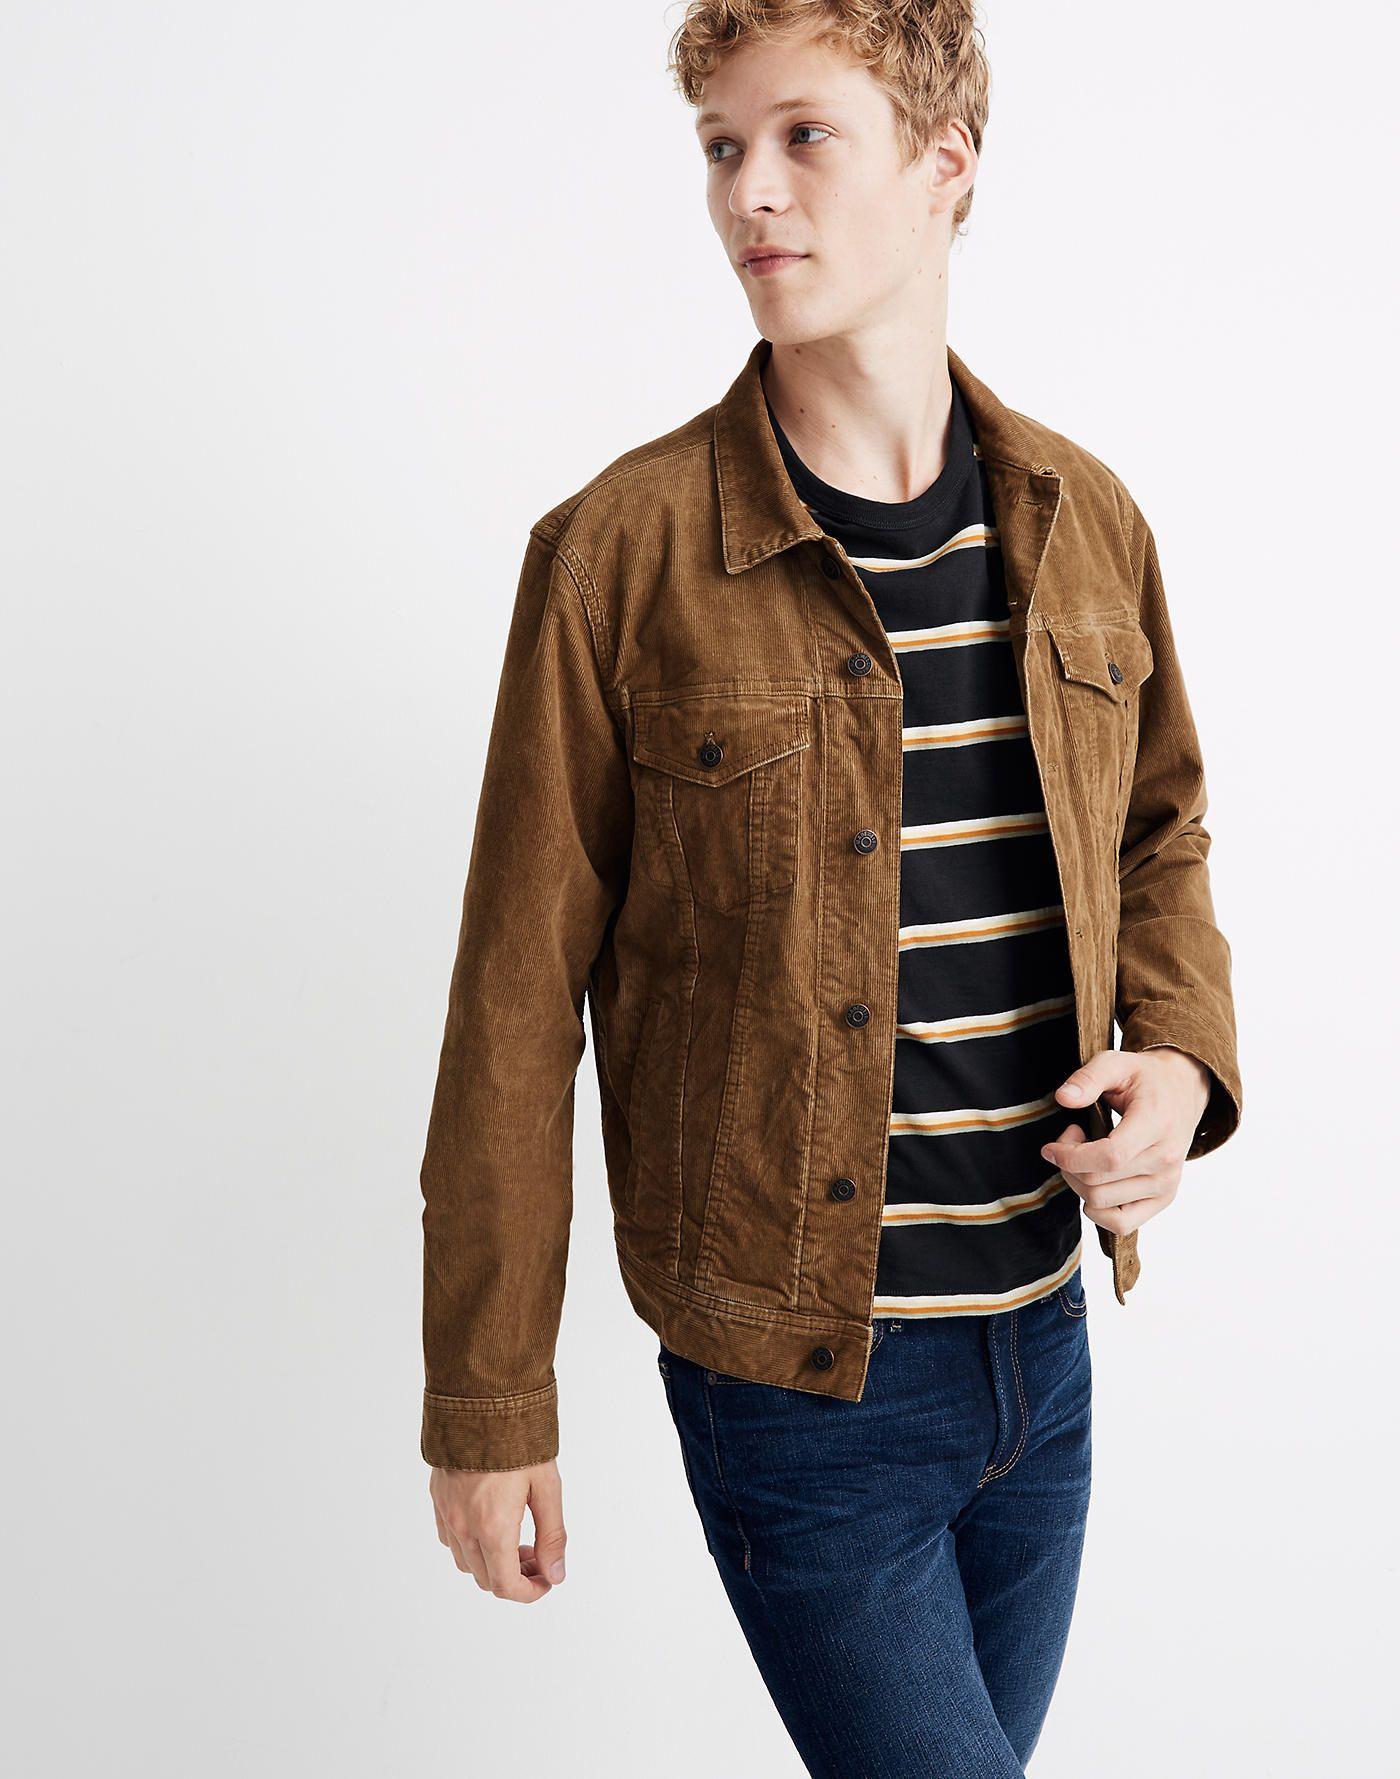 Classic Jean Jacket Corduroy Edition Denim Jacket Men Classic Jeans Jean Jacket [ 1779 x 1400 Pixel ]